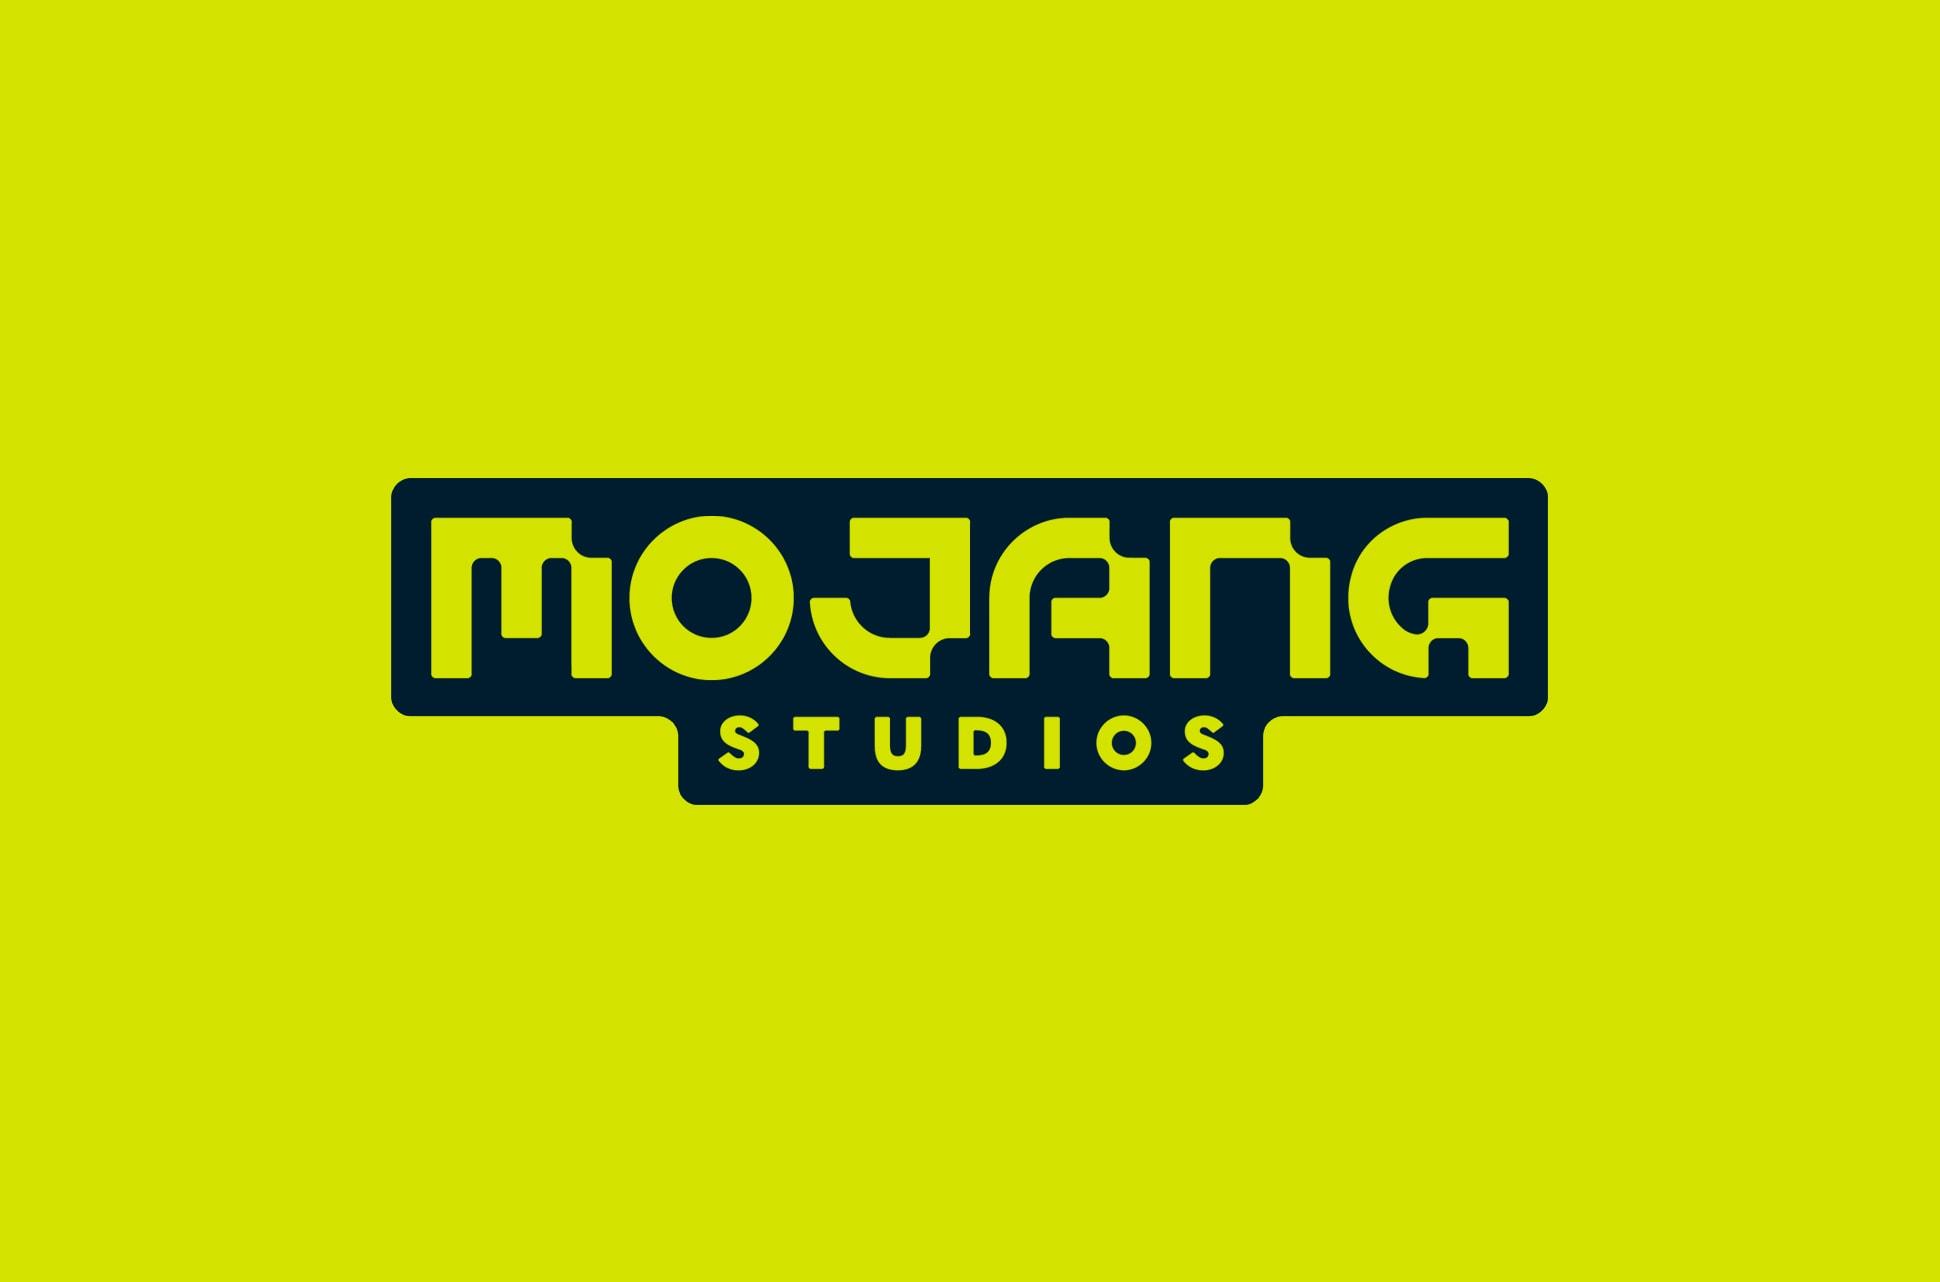 Mojang Studios logo.